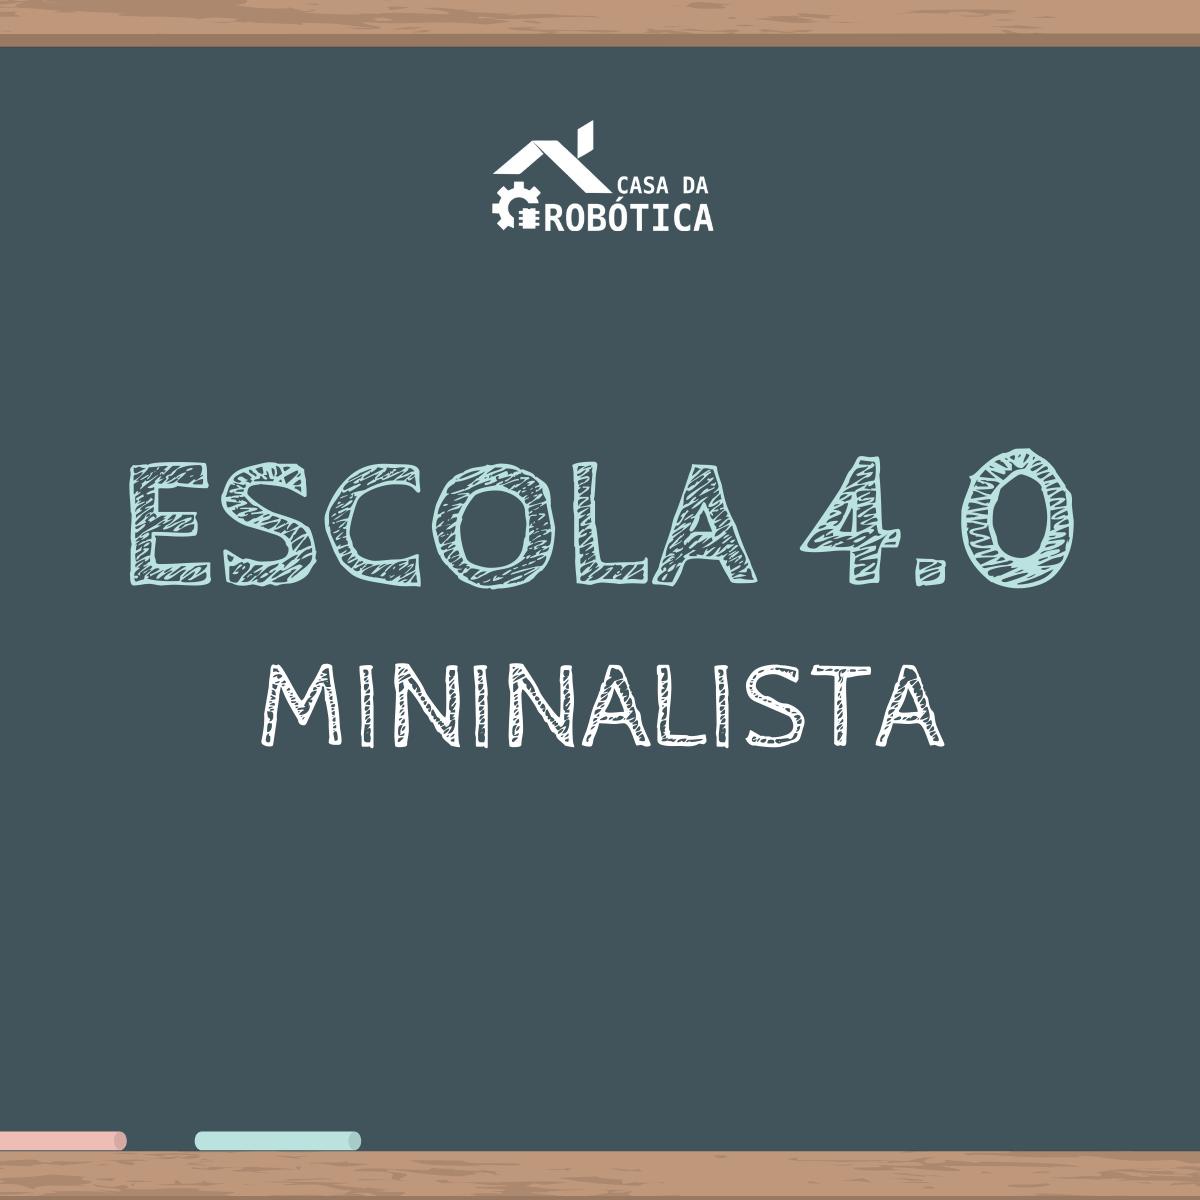 KIT Minimalista - Escola 4.0